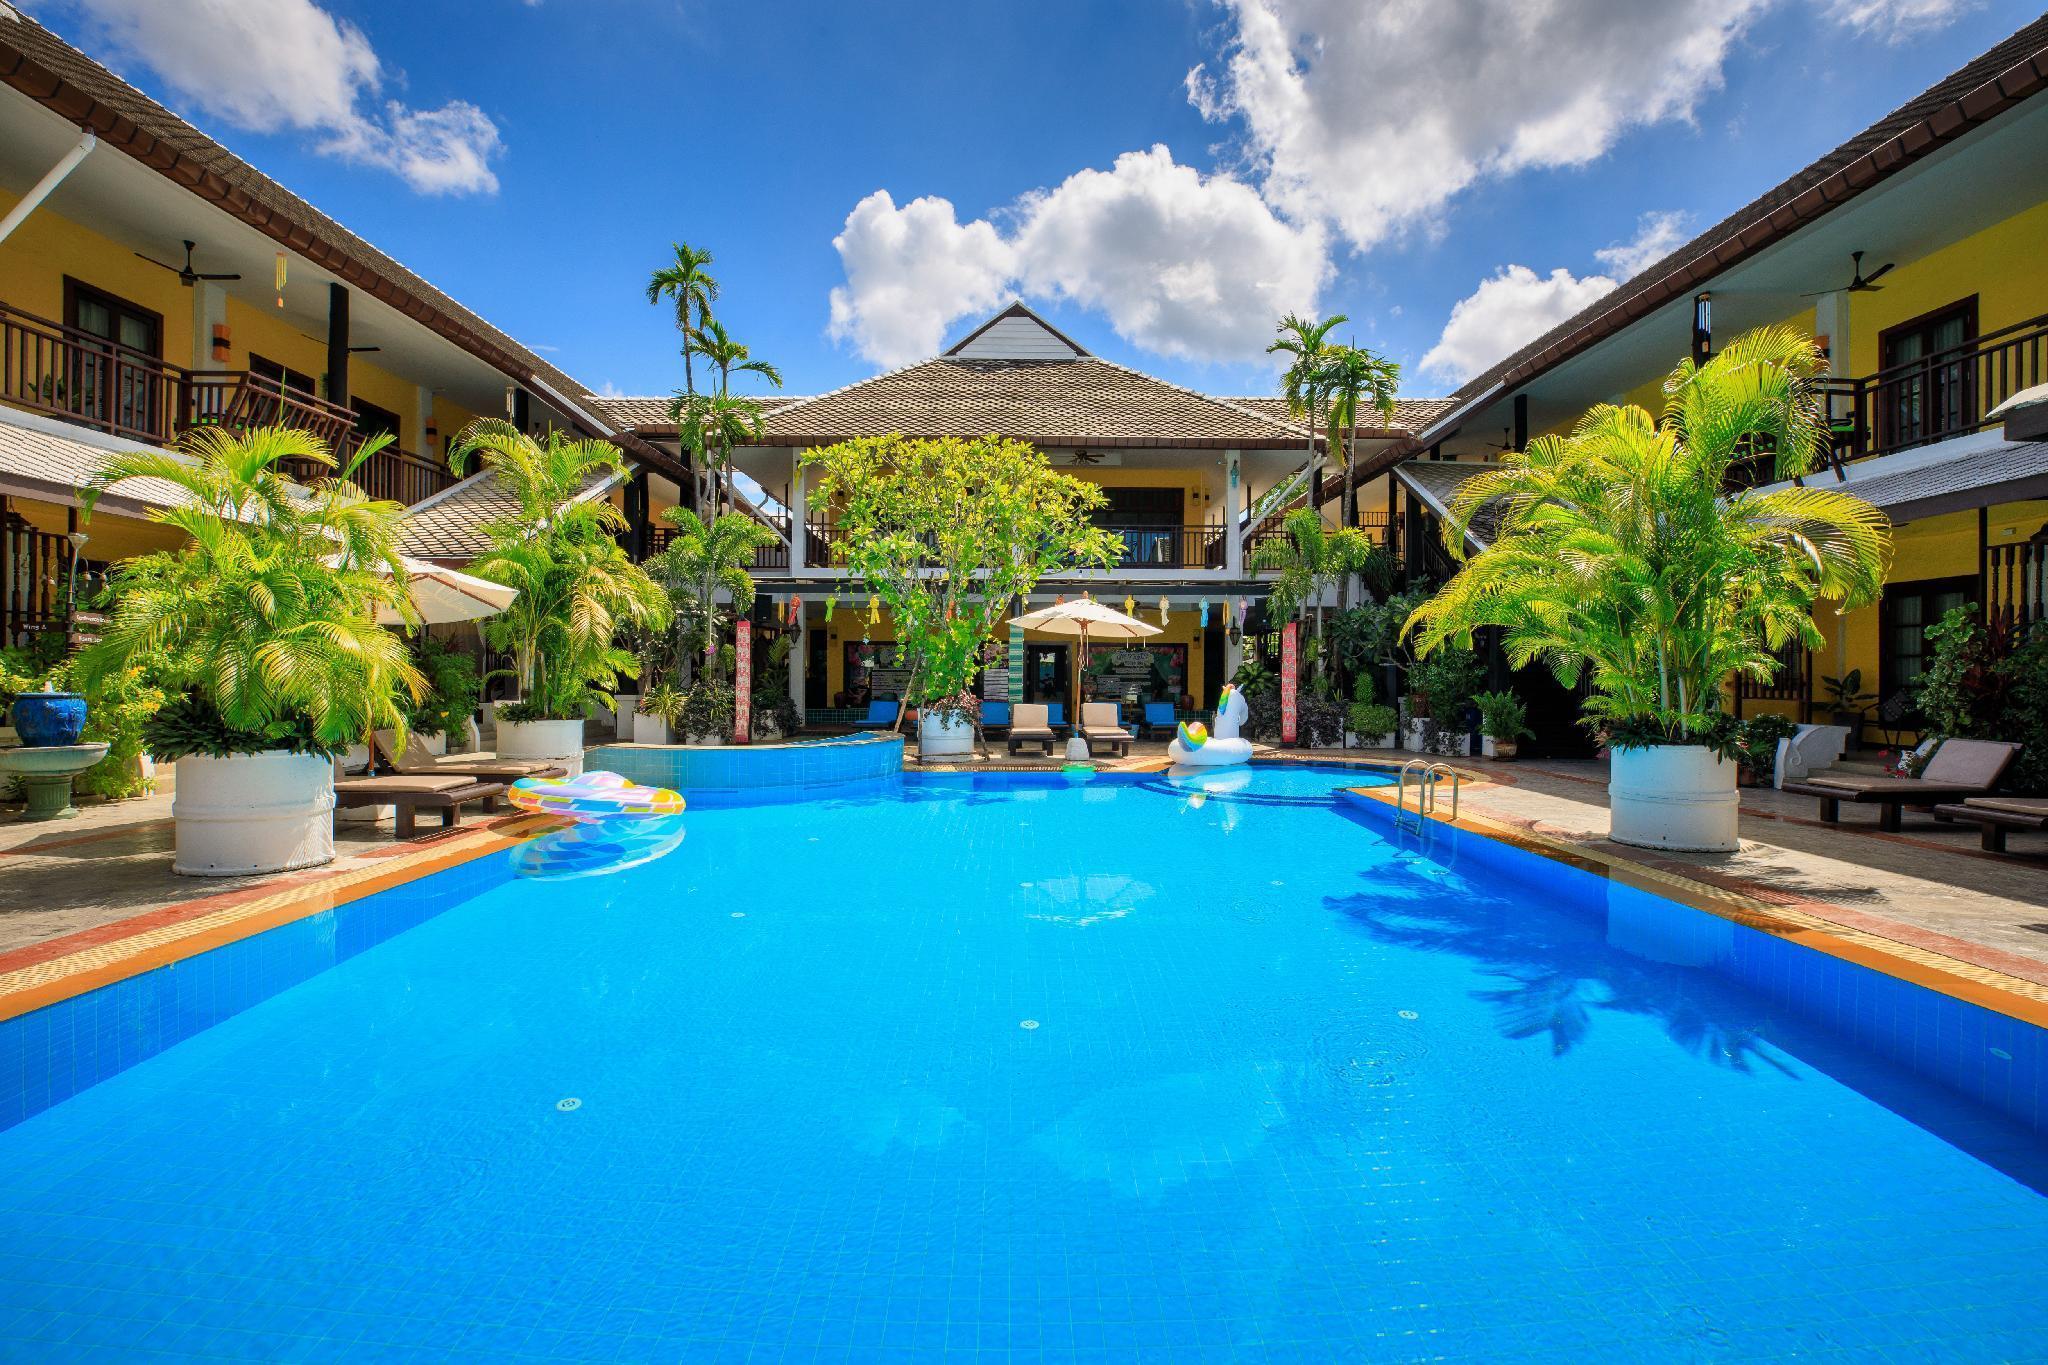 Vdara Pool Resort Spa, Chiang Mai วีดารา พูล รีสอร์ต สปา เชียงใหม่